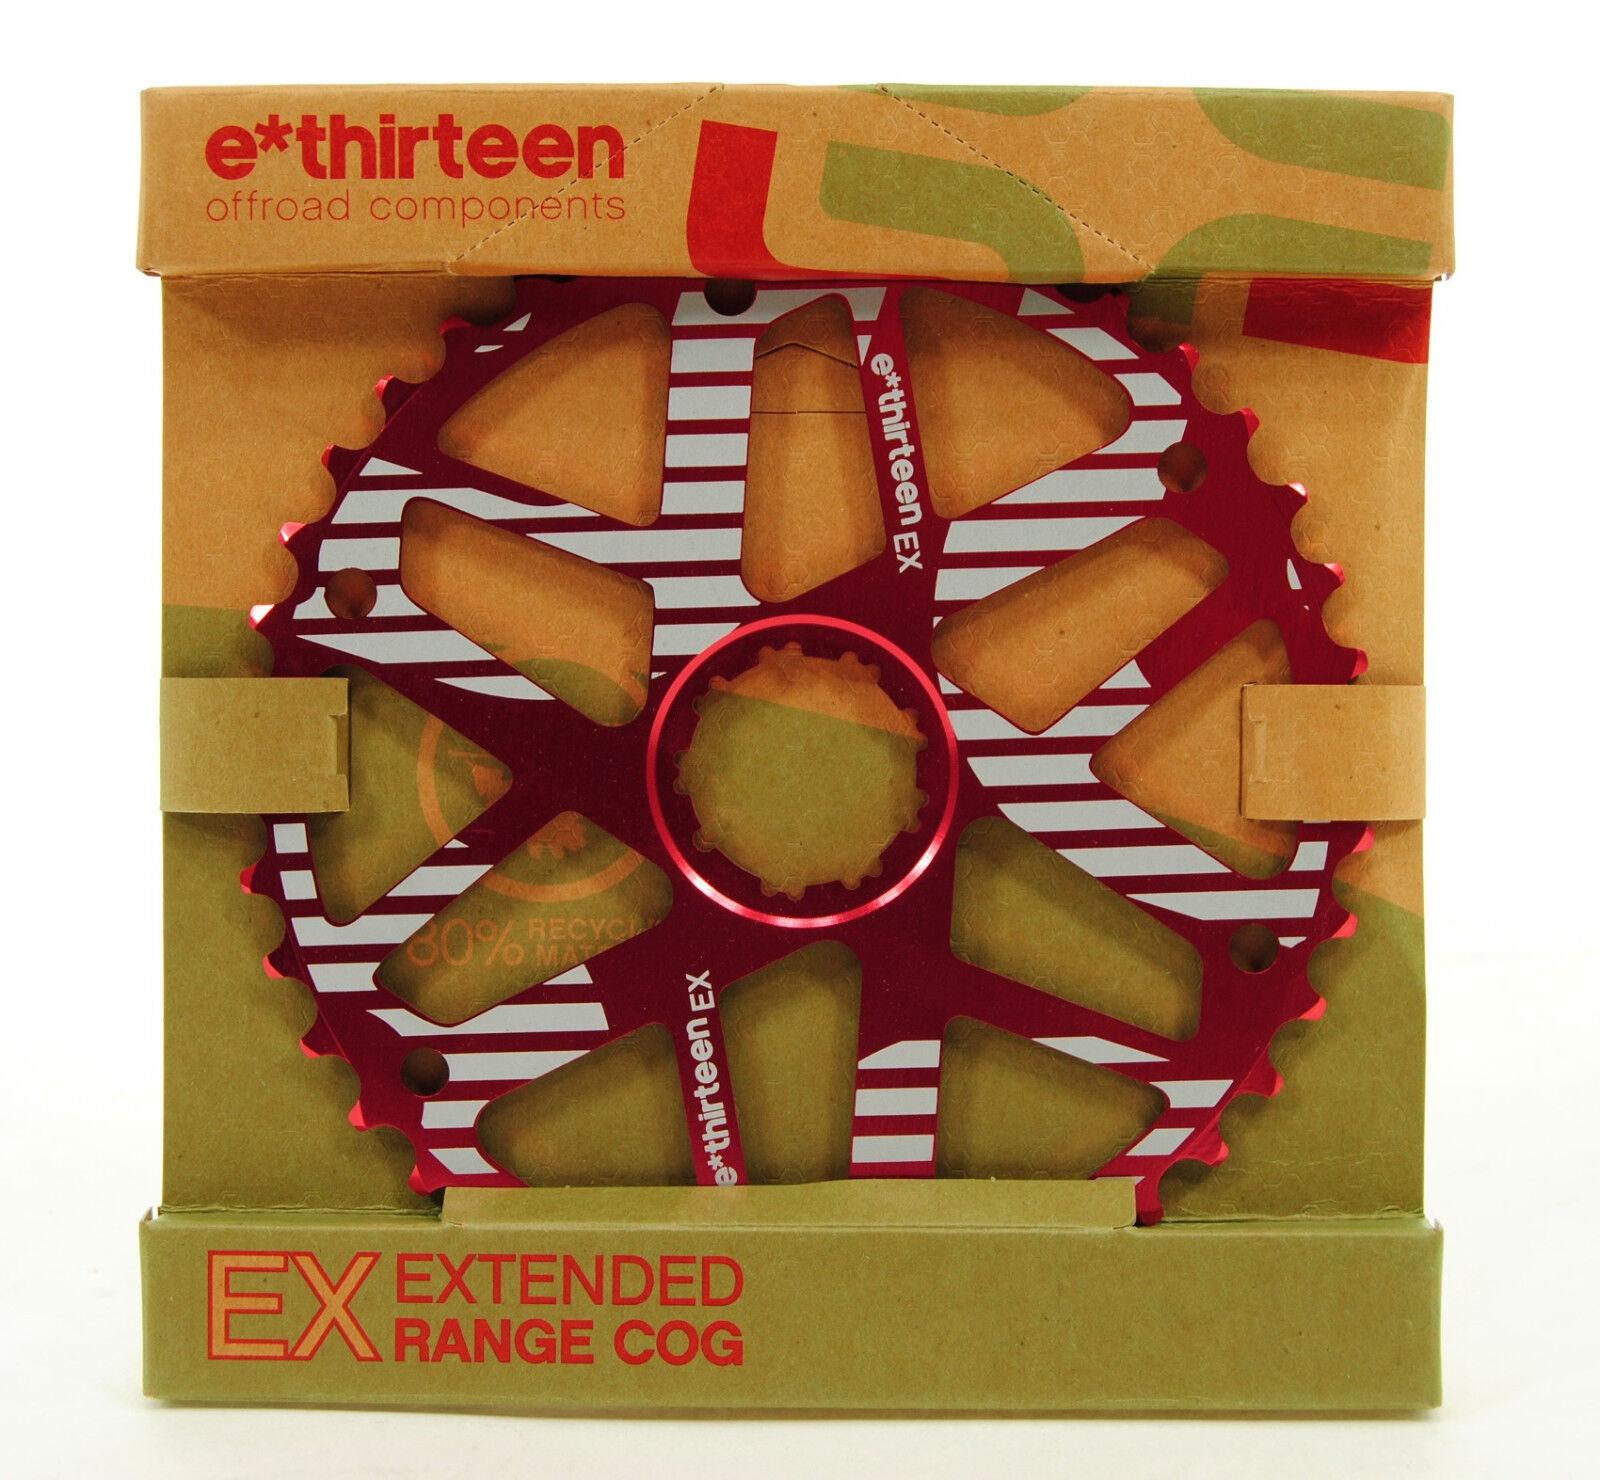 Ethirteen Extended Range Cog 40t, Shimano 34t Compatible, Red